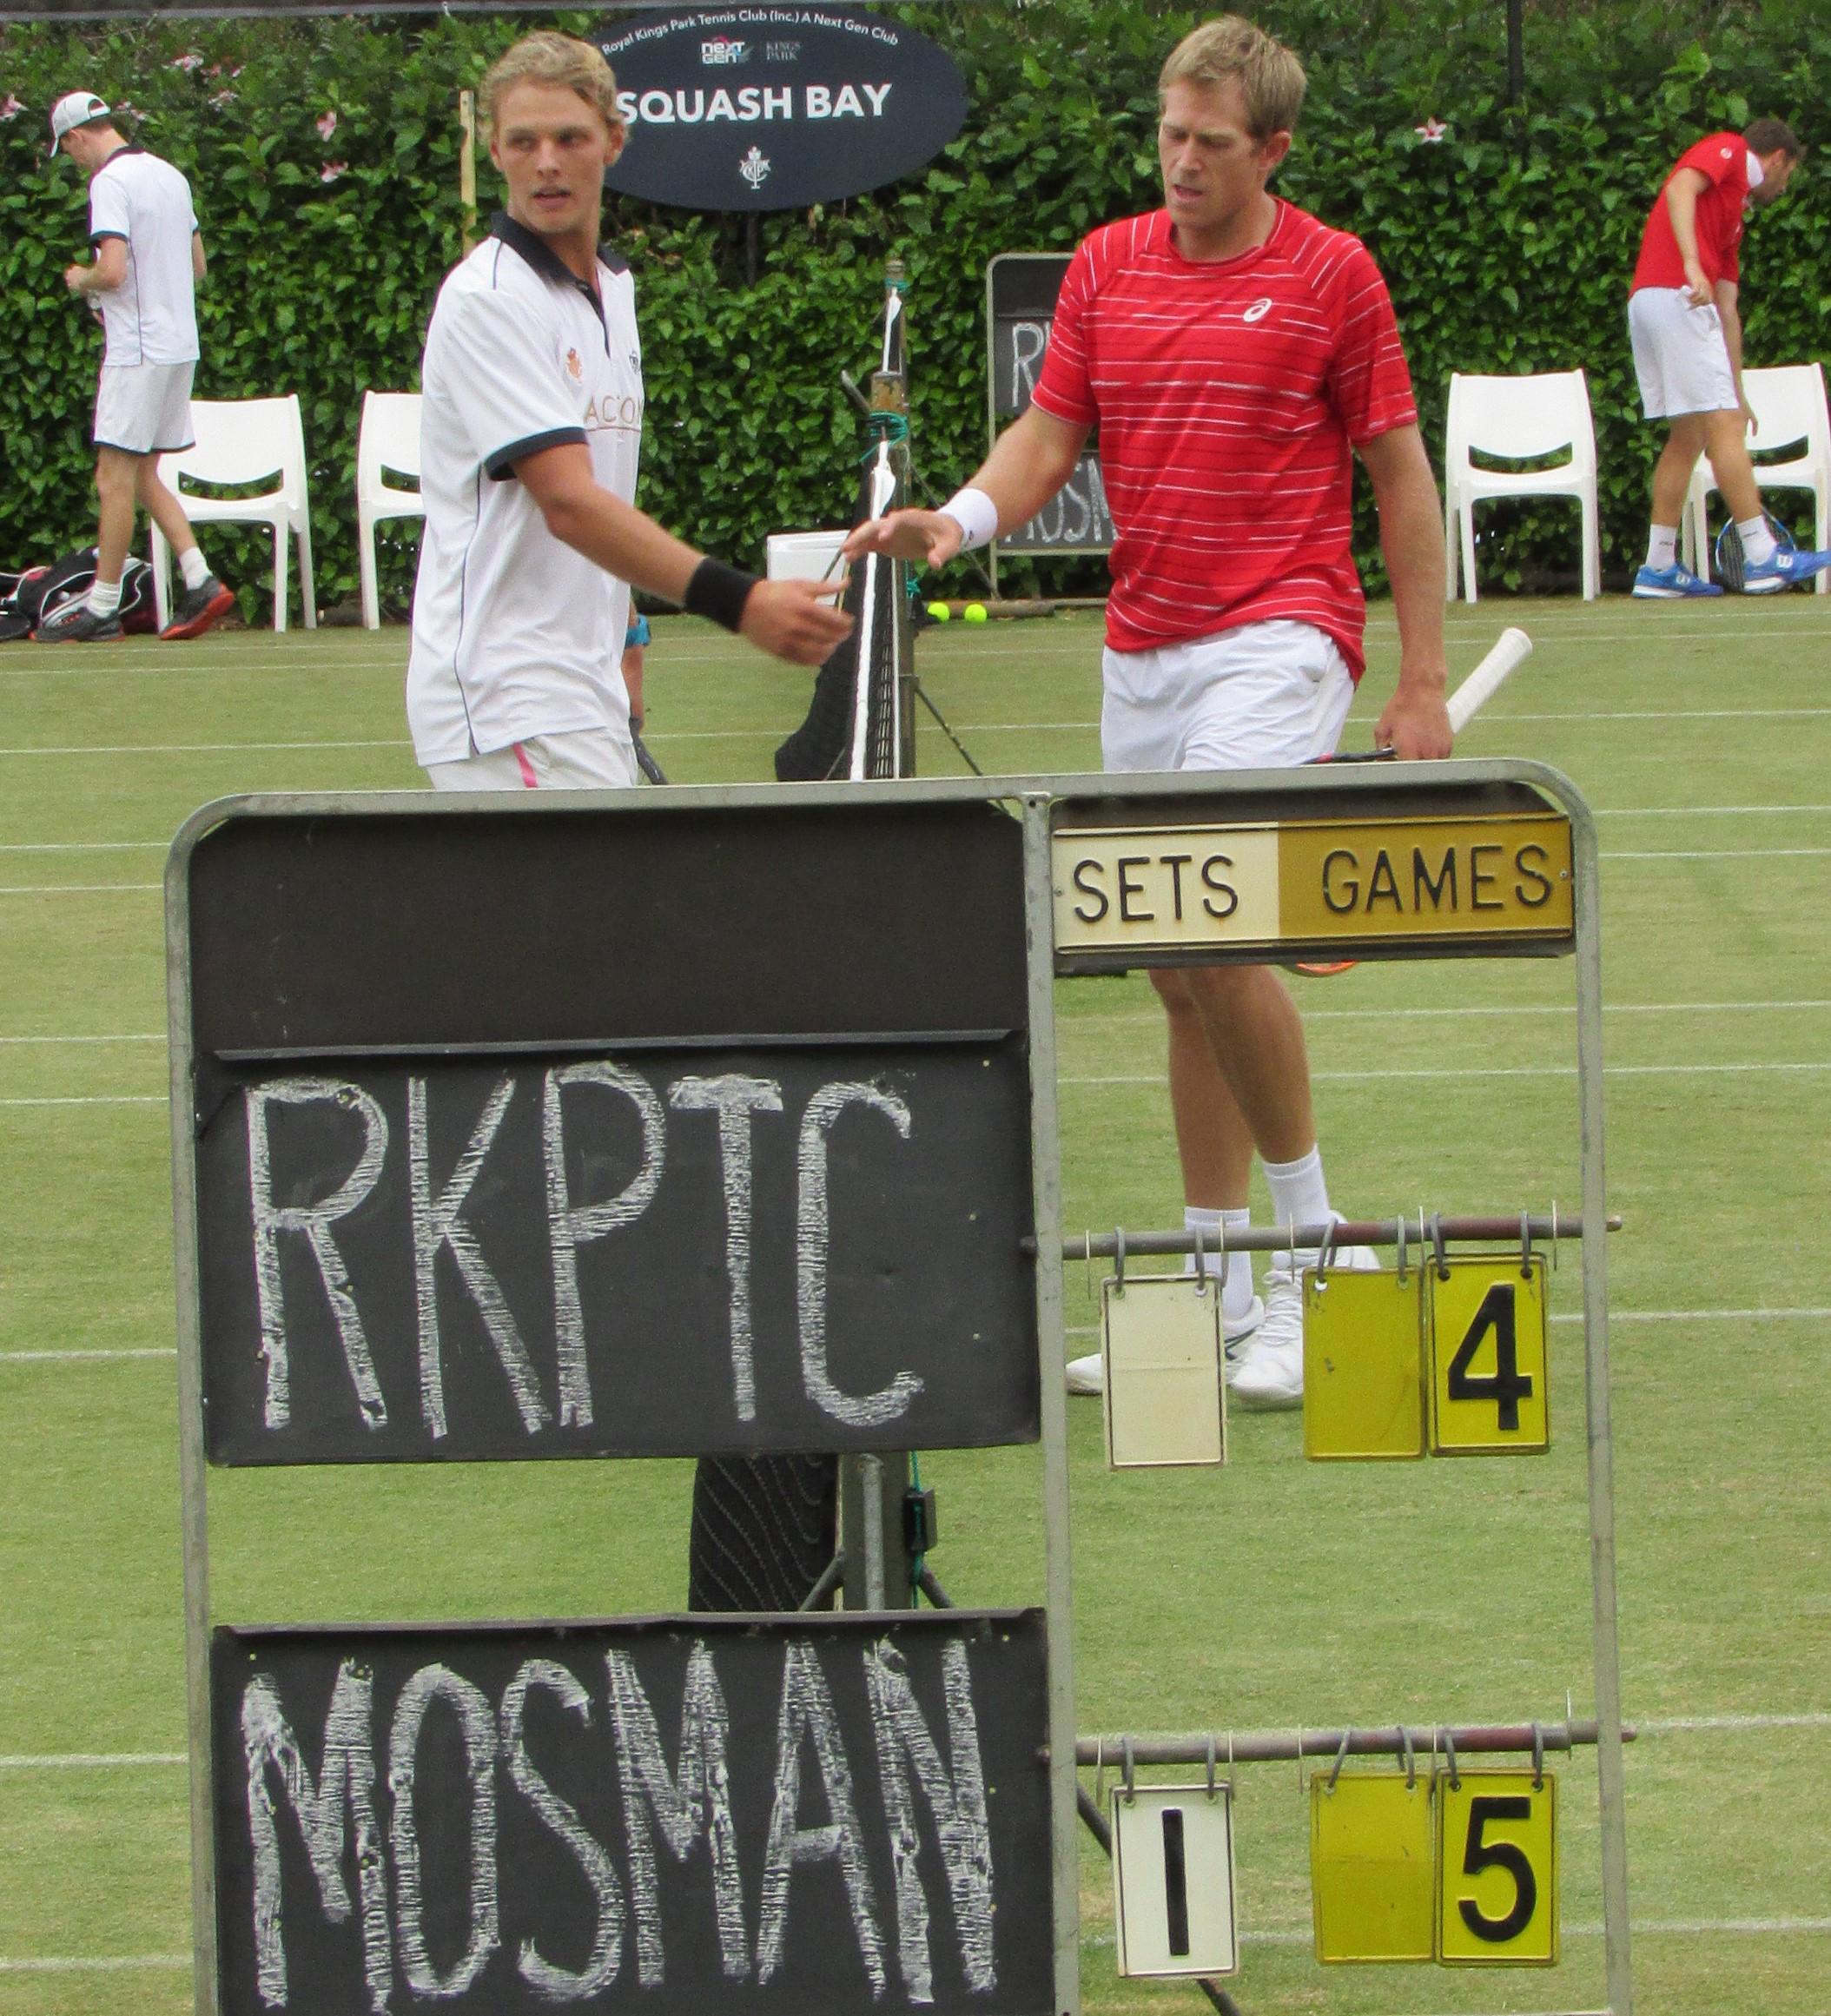 Tennis: Mosman Park serves up upset, defeats minor premier Kings Park for place in grand final